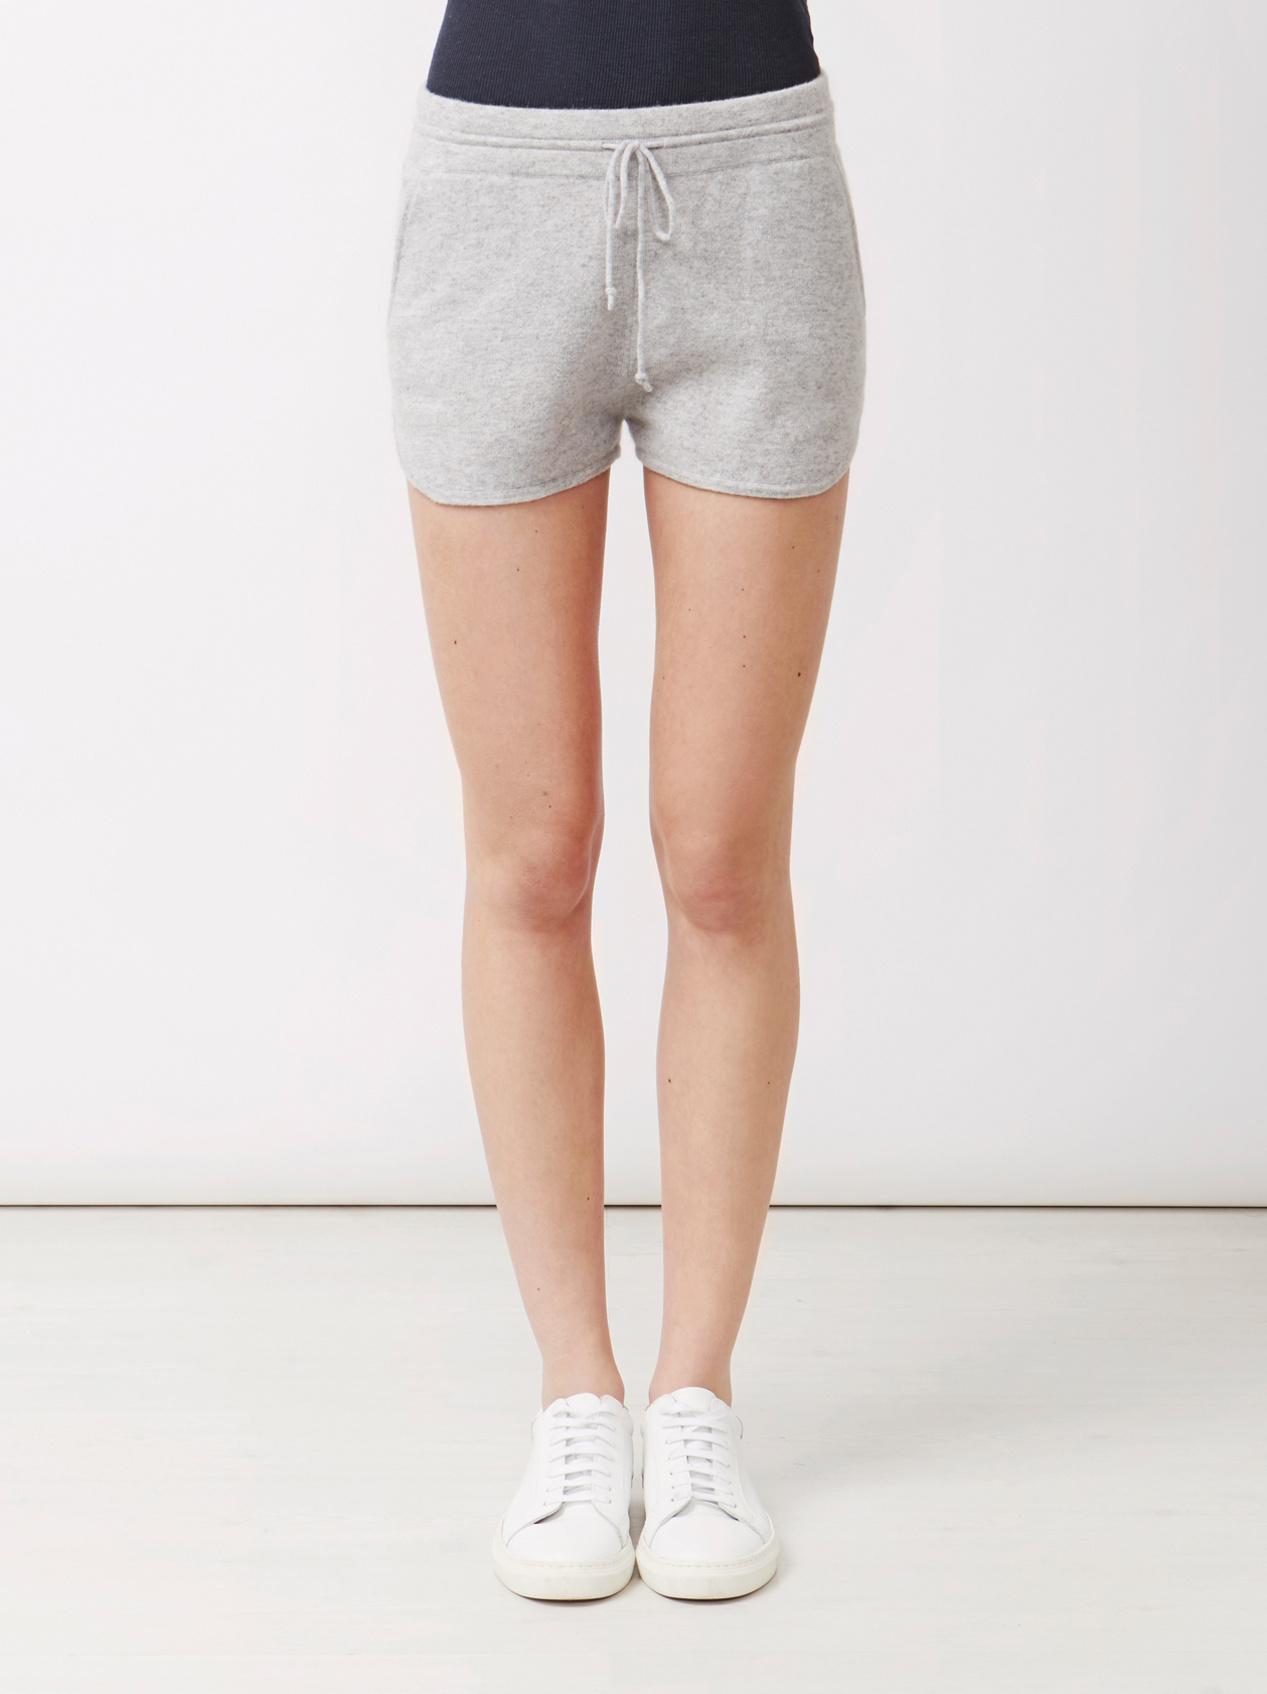 Soft Goat Women's Shorts Light Grey